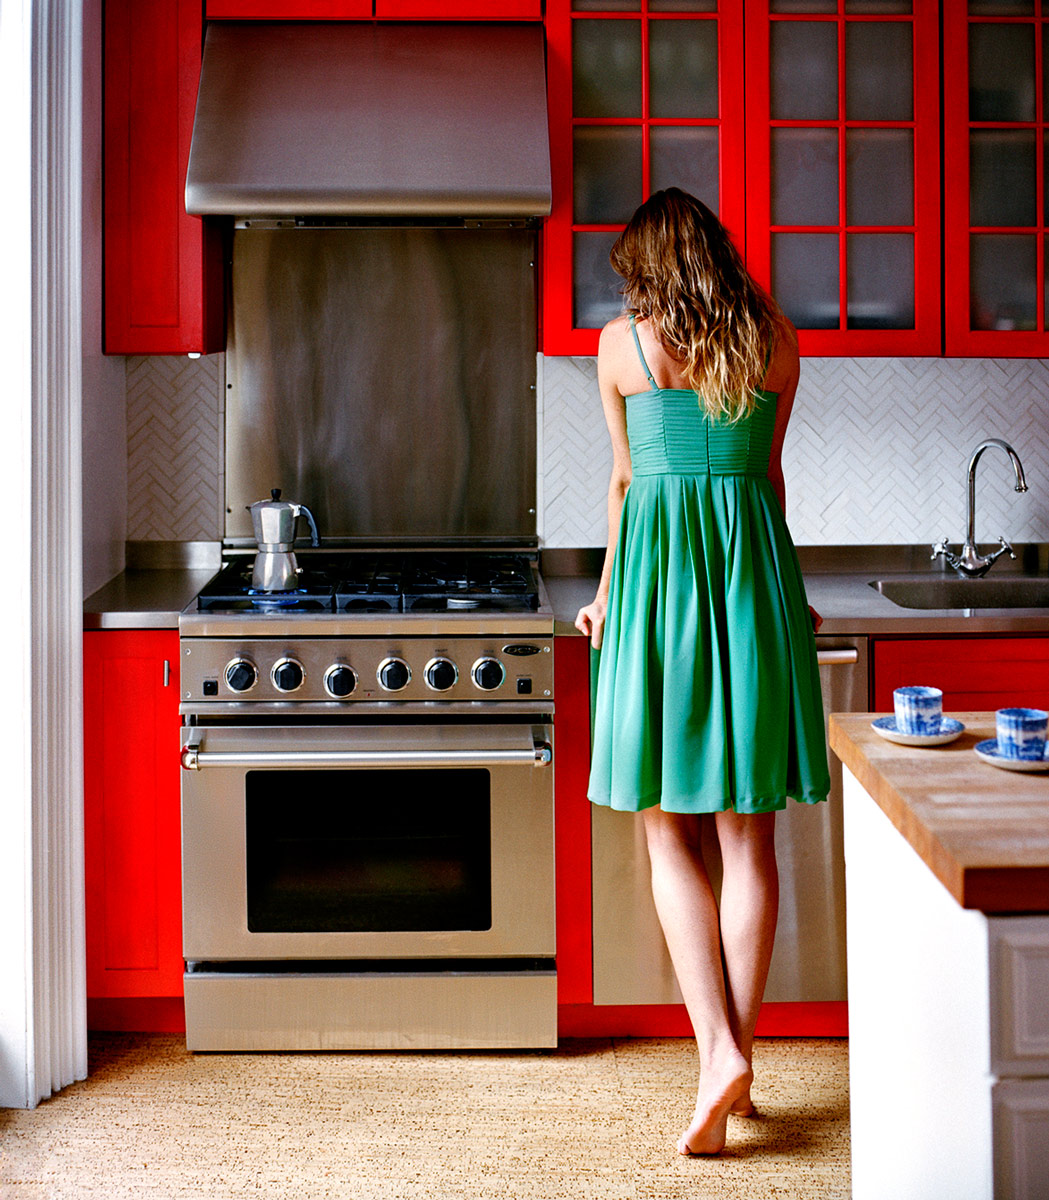 Red-Kitchen-Coffee-Stove.jpg